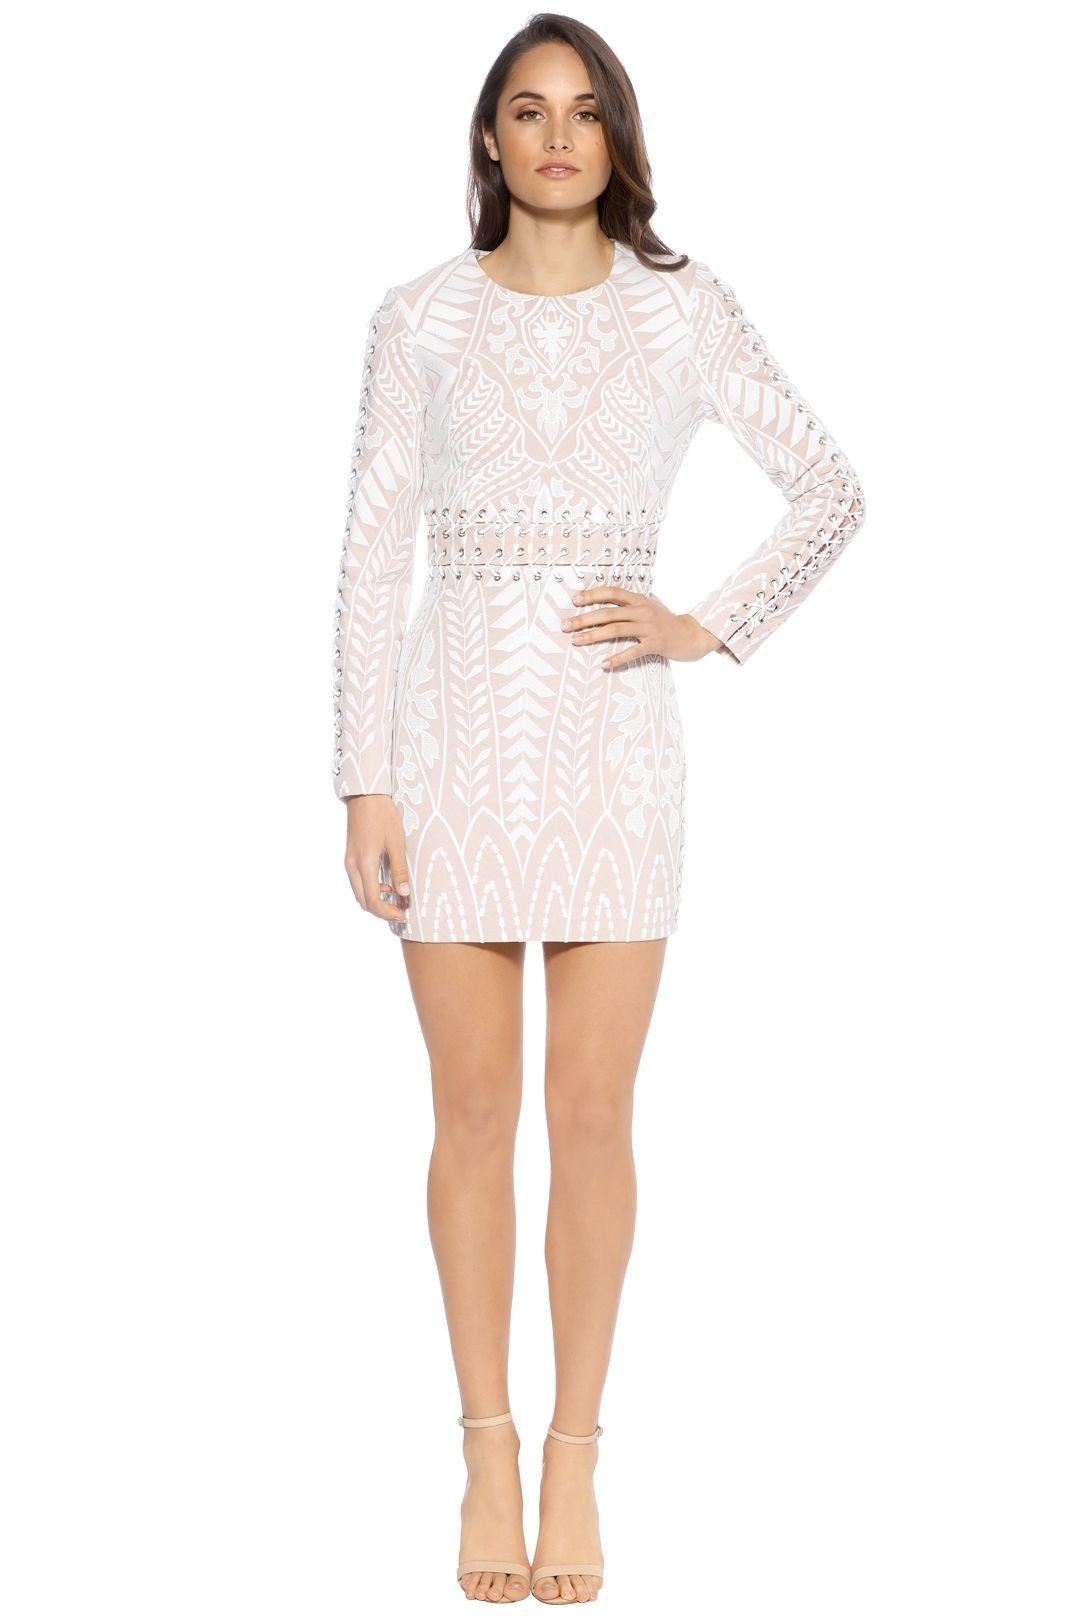 Enchanted Garden Dress - Blush White - Front